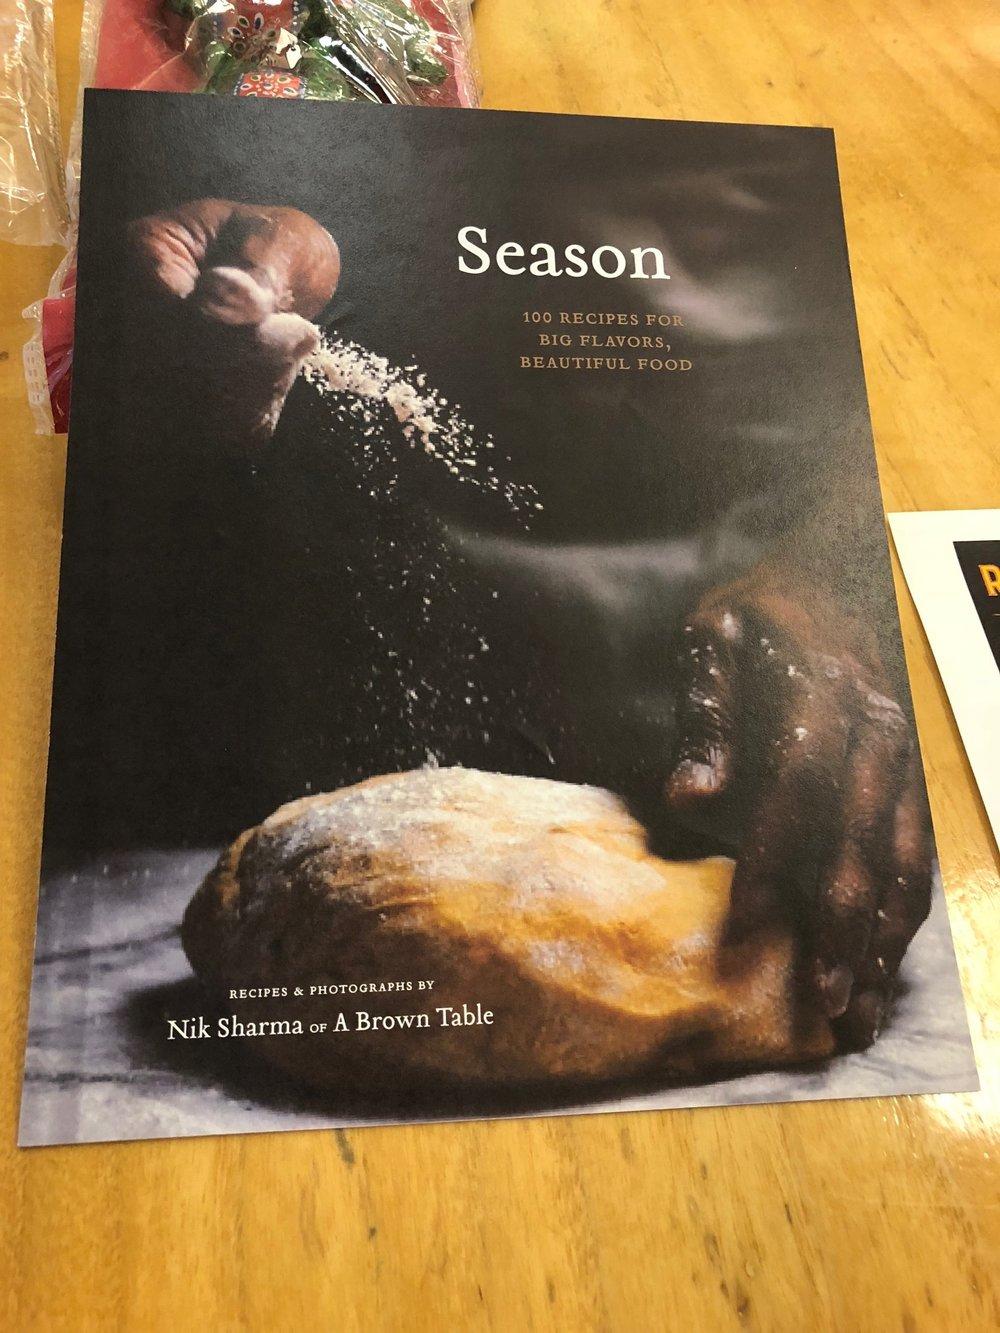 Season Cookbook Cover Design - The Book Diaries III | Nik Sharma